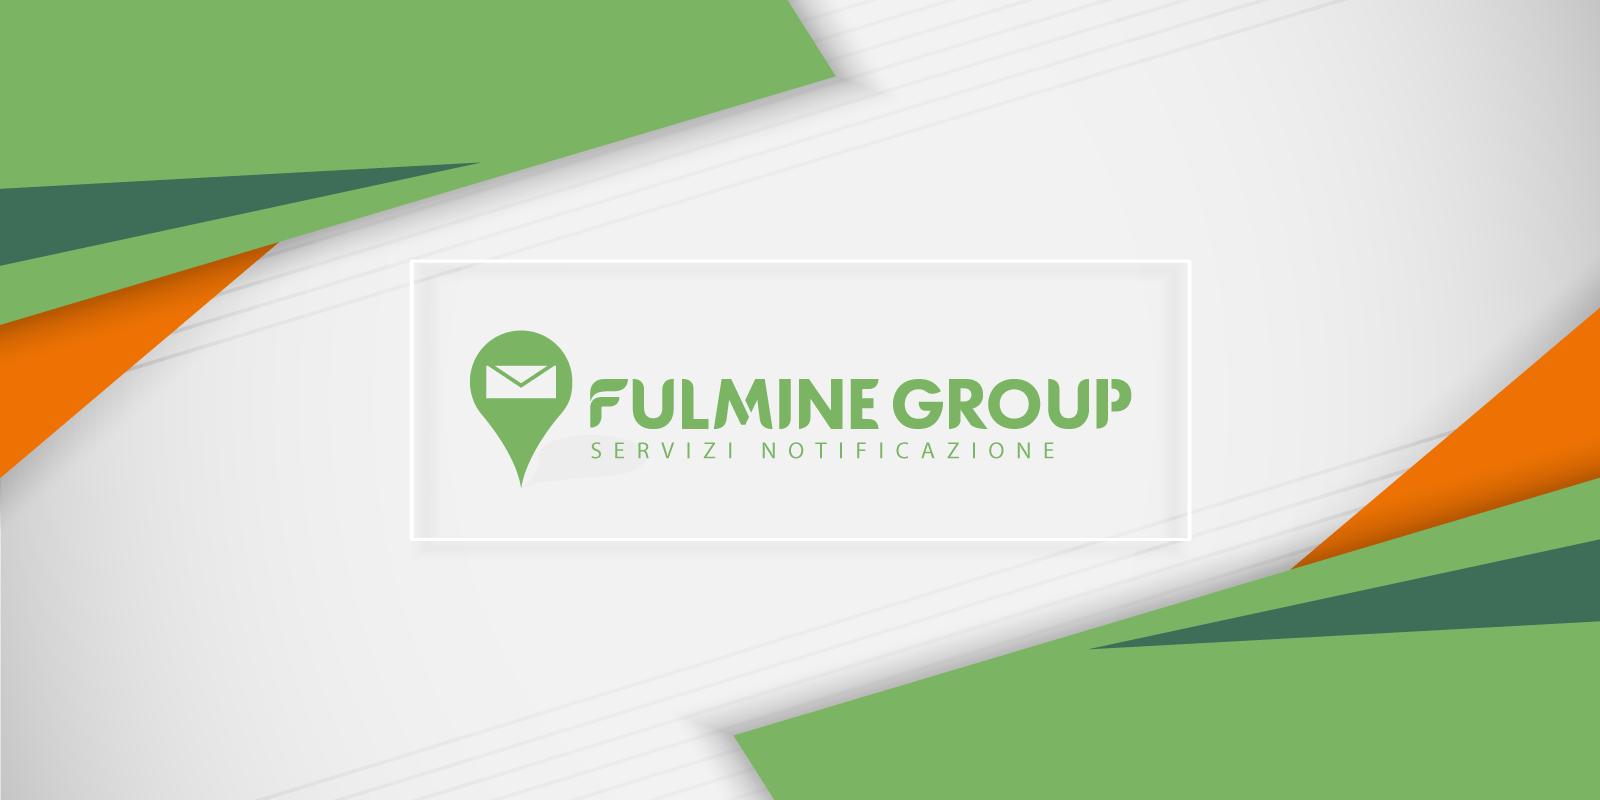 Servizi Notificazione, Fulmine Group